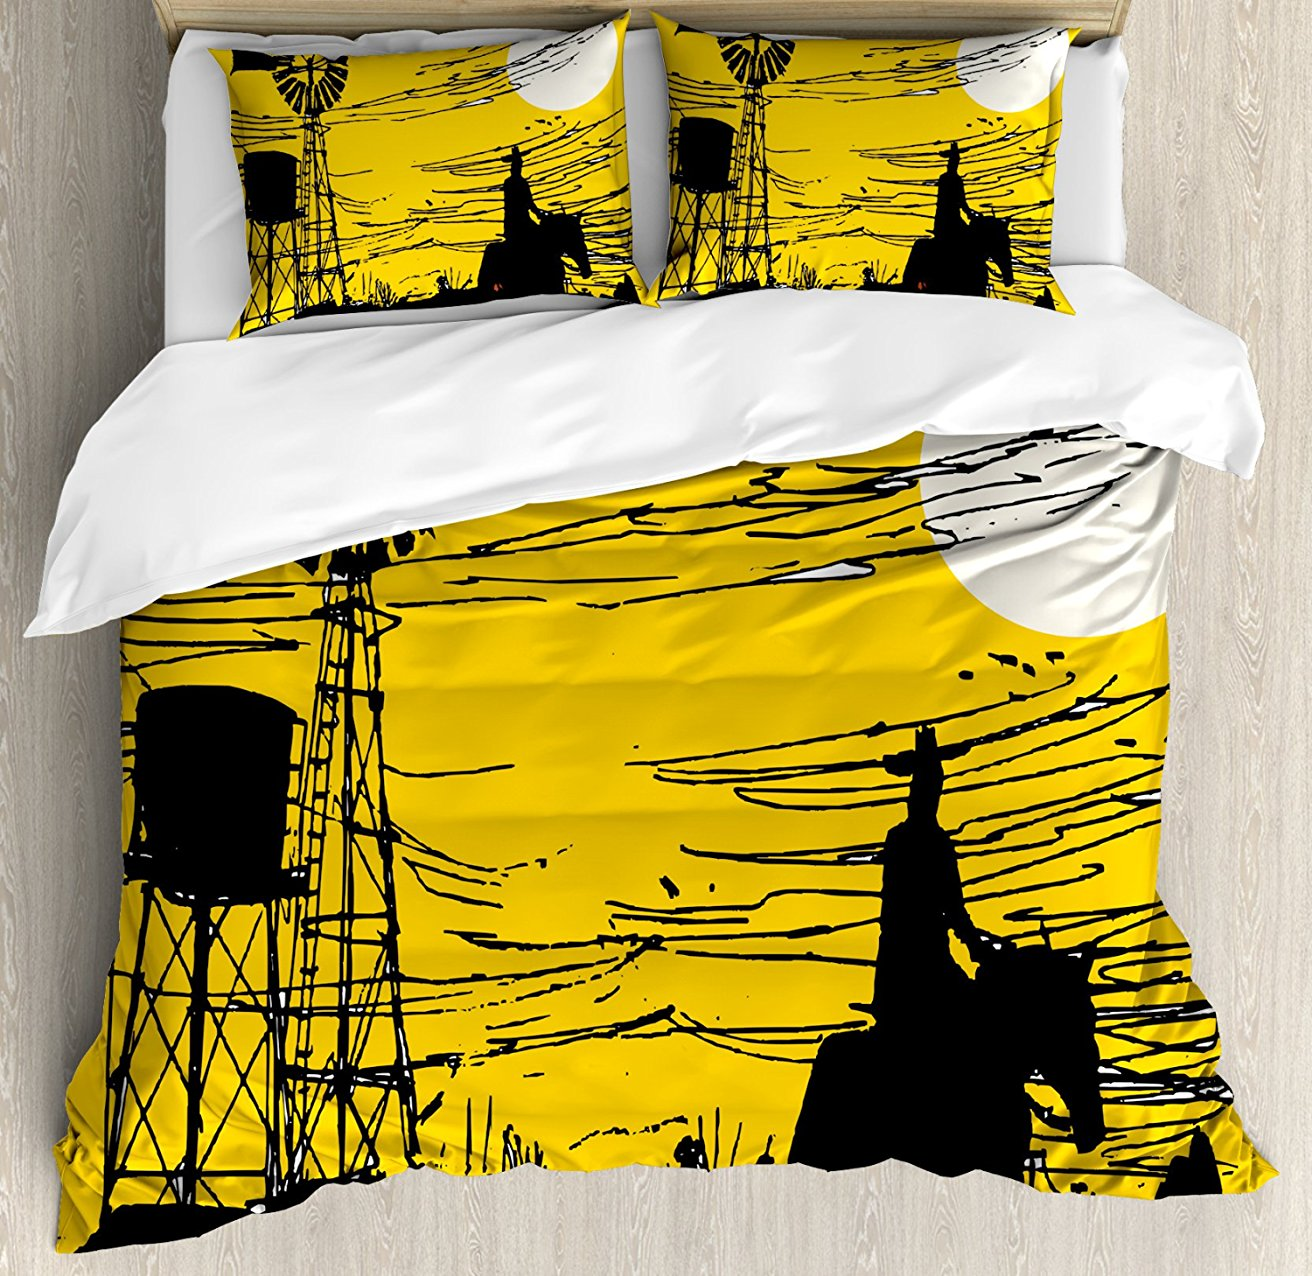 Windmill Decor Duvet Cover Set, Australian Outback Inspired Artwork Cowboy on Horse at Sunset, 4 Piece Bedding Set